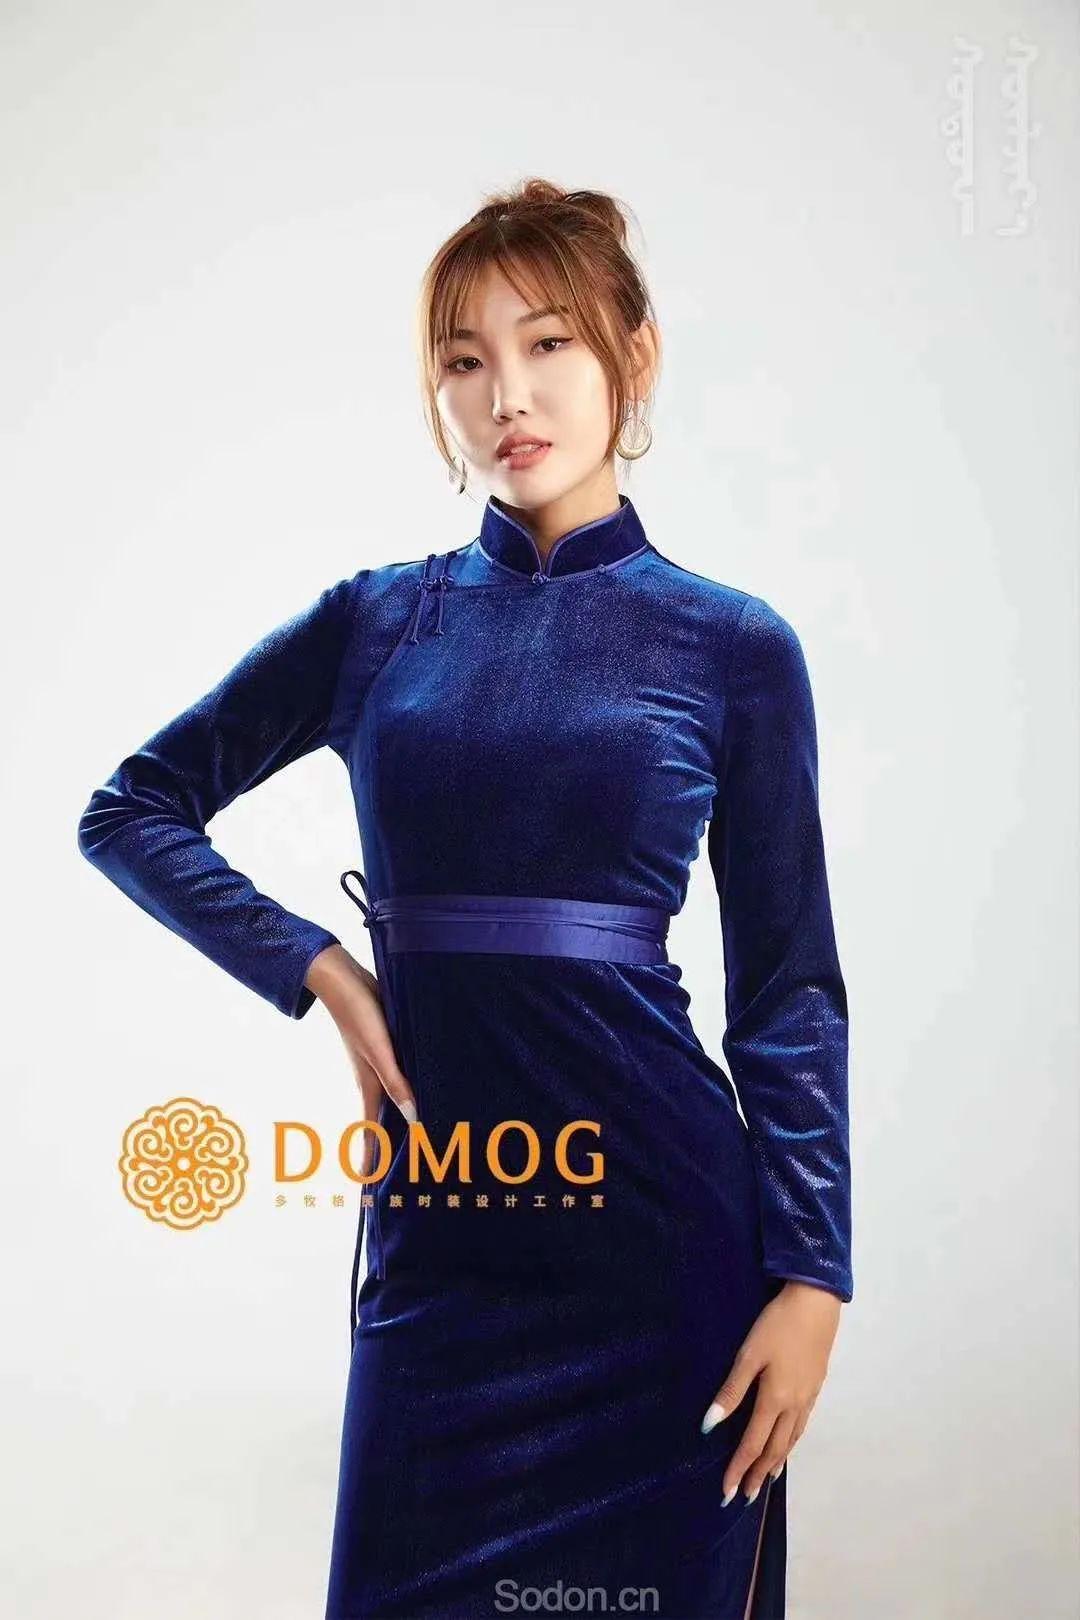 DOMOG 蒙古时装2020新款,民族与时尚的融合 第51张 DOMOG 蒙古时装2020新款,民族与时尚的融合 蒙古服饰